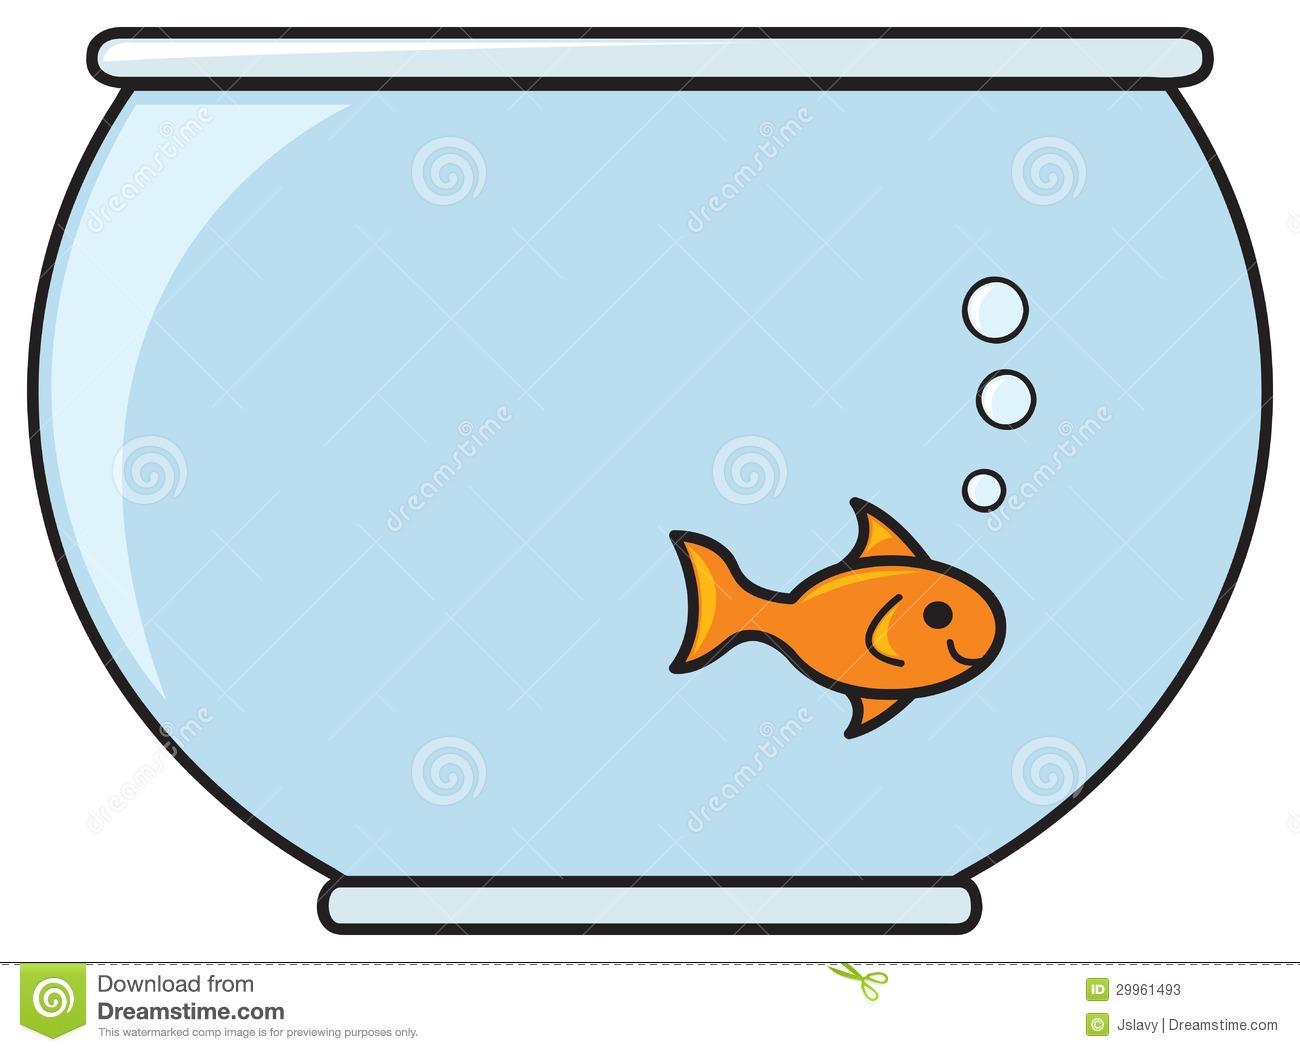 Bowl clipart aquarium. Awesome design digital collection